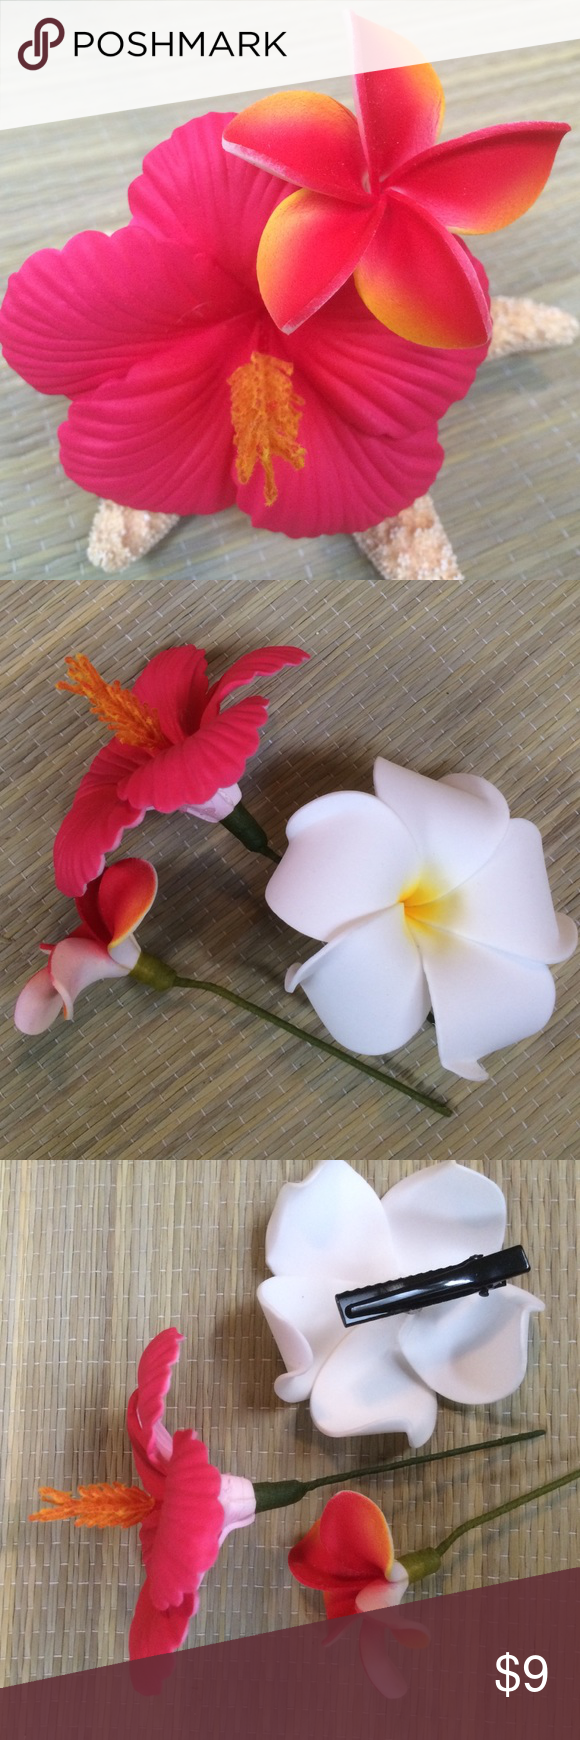 Bundle 2 faux hawaiian flower pics hair clip my posh picks bundle 2 faux hawaiian flower pics hair clip bundle 3 faux flower hair 1 dark pink hawaiian hibiscus flower and 1 small dark pink plumeria pics izmirmasajfo